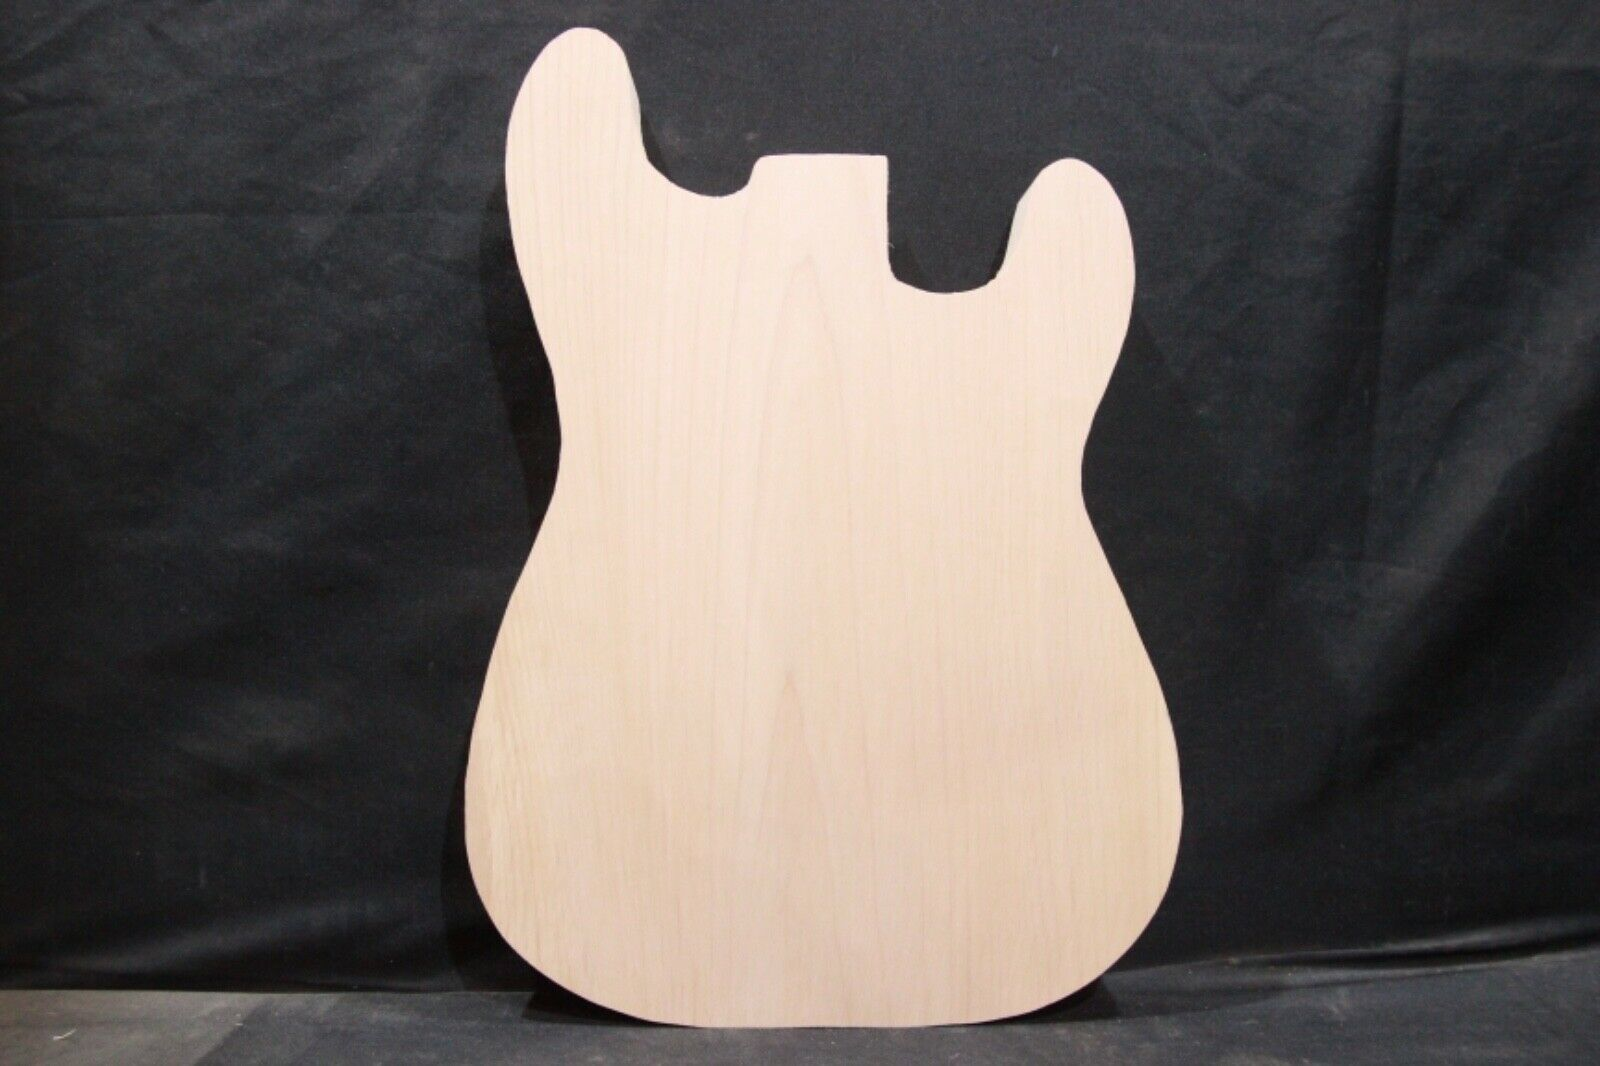 Alder 1-piece guitar body blank   Cut to  STRAT  shape    2367